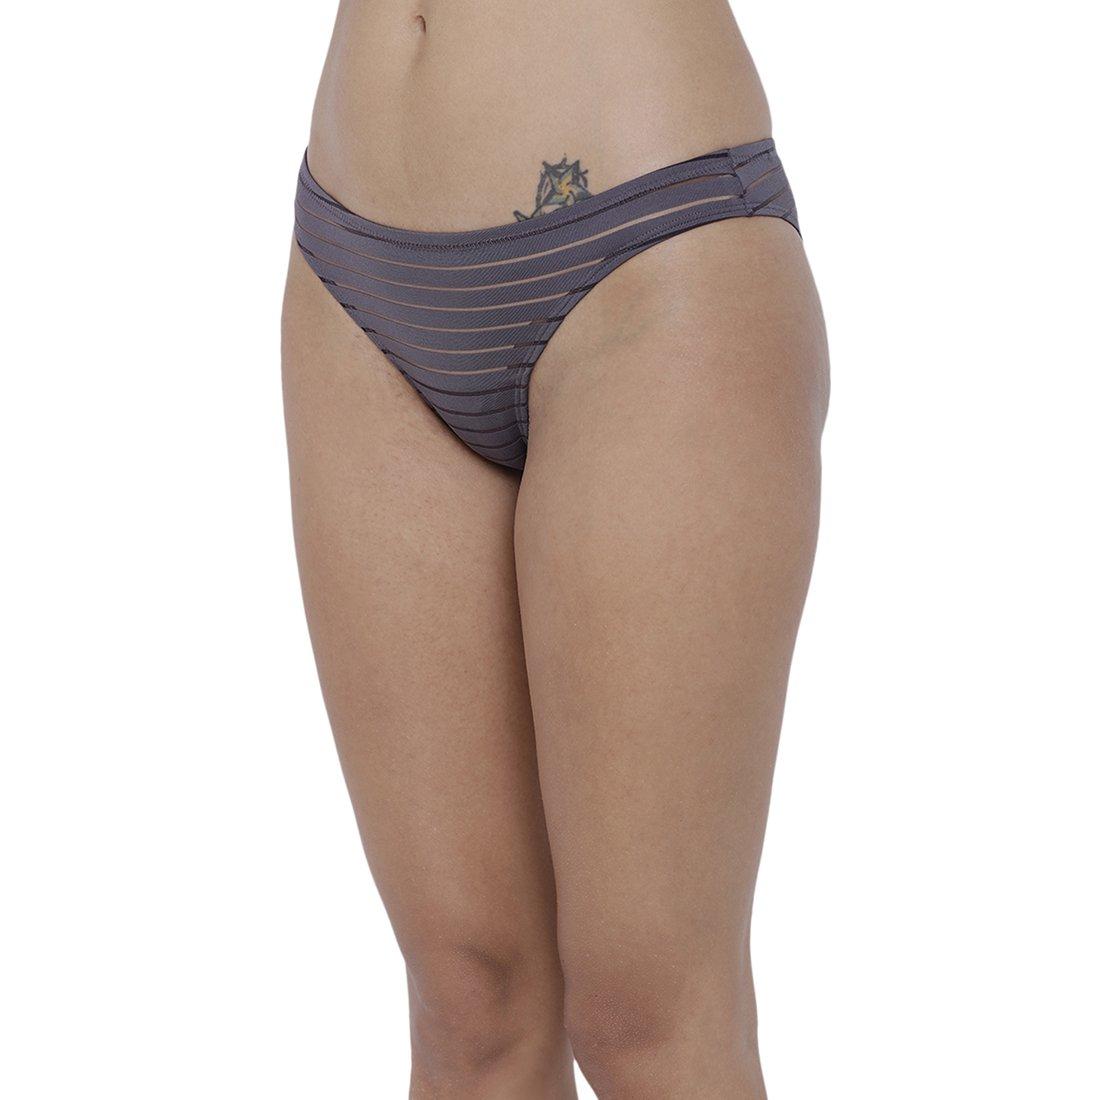 20e51ced26ff BASIICS by La Intimo Women's PolyMonoSpandex Travieso Naughty Brief  Panty_BCPBR02PG0_Petrol Grey: Amazon.in: Clothing & Accessories